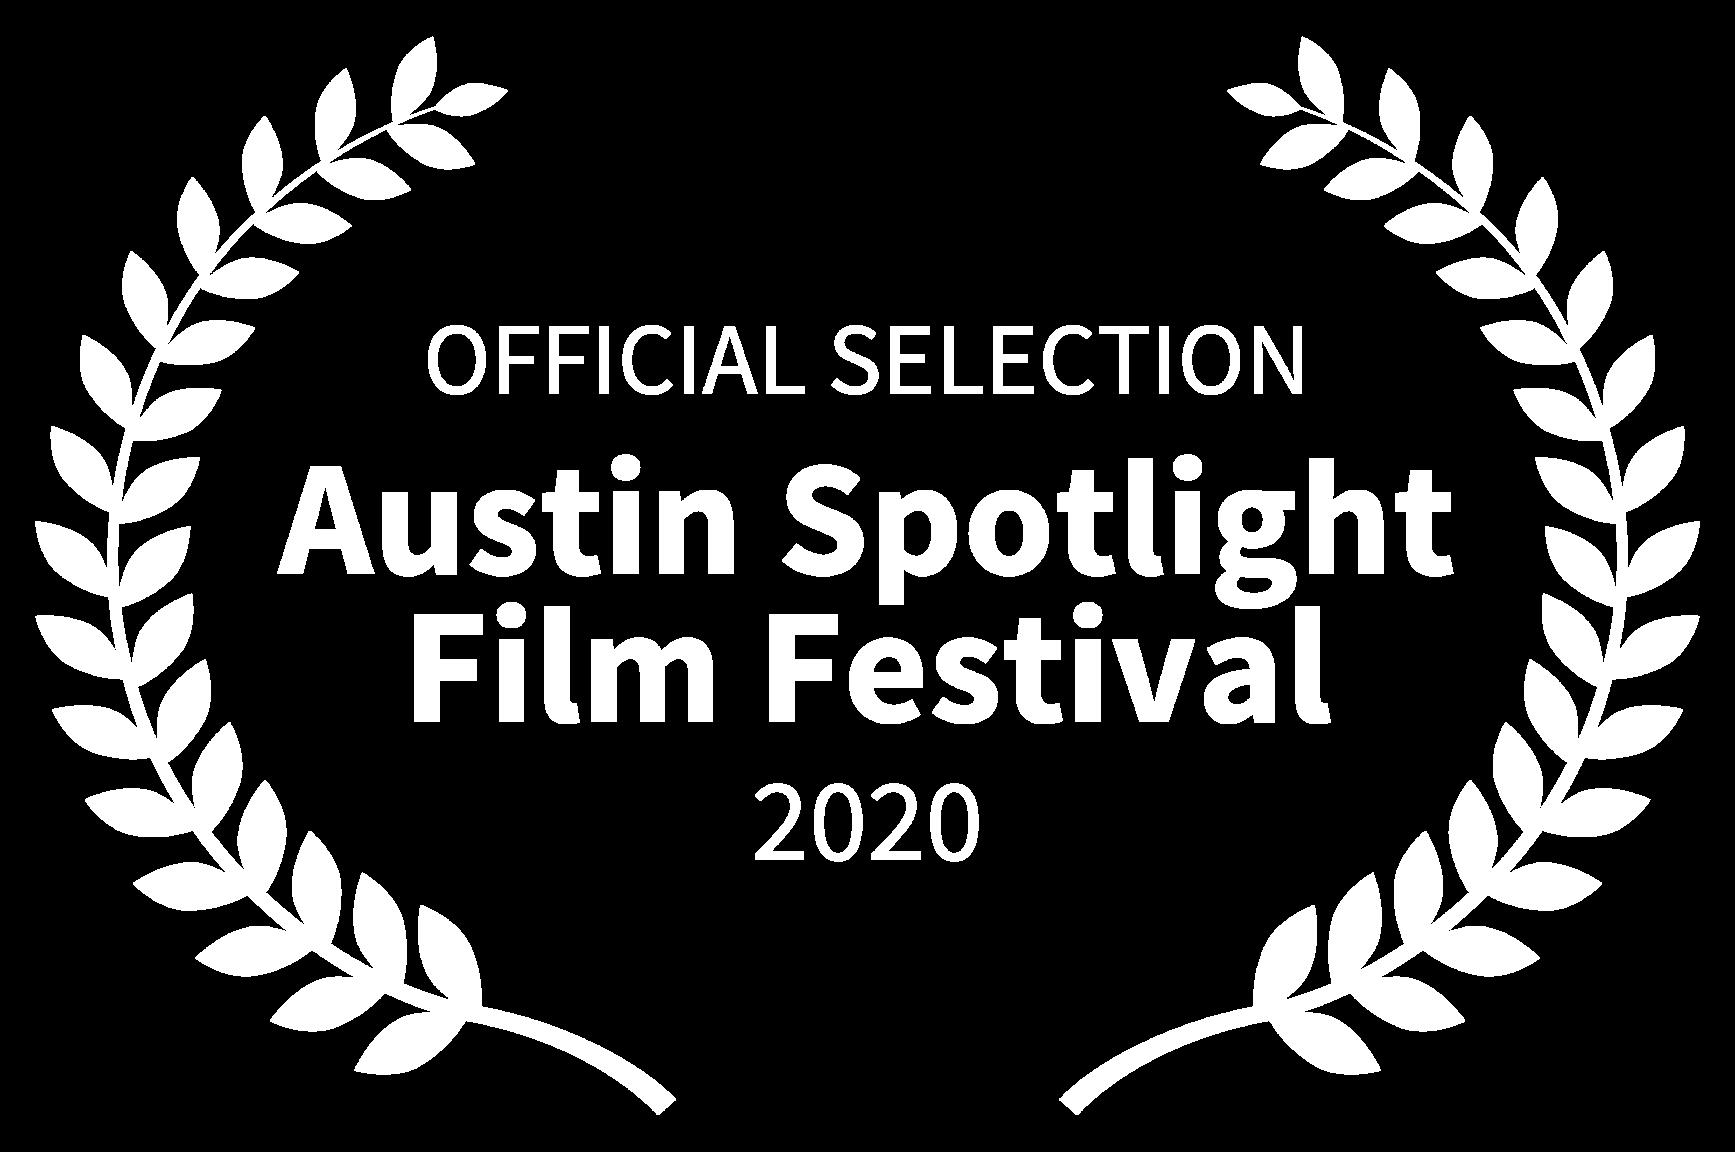 OFFICIAL SELECTION - Austin Spotlight Film Festival - 2020